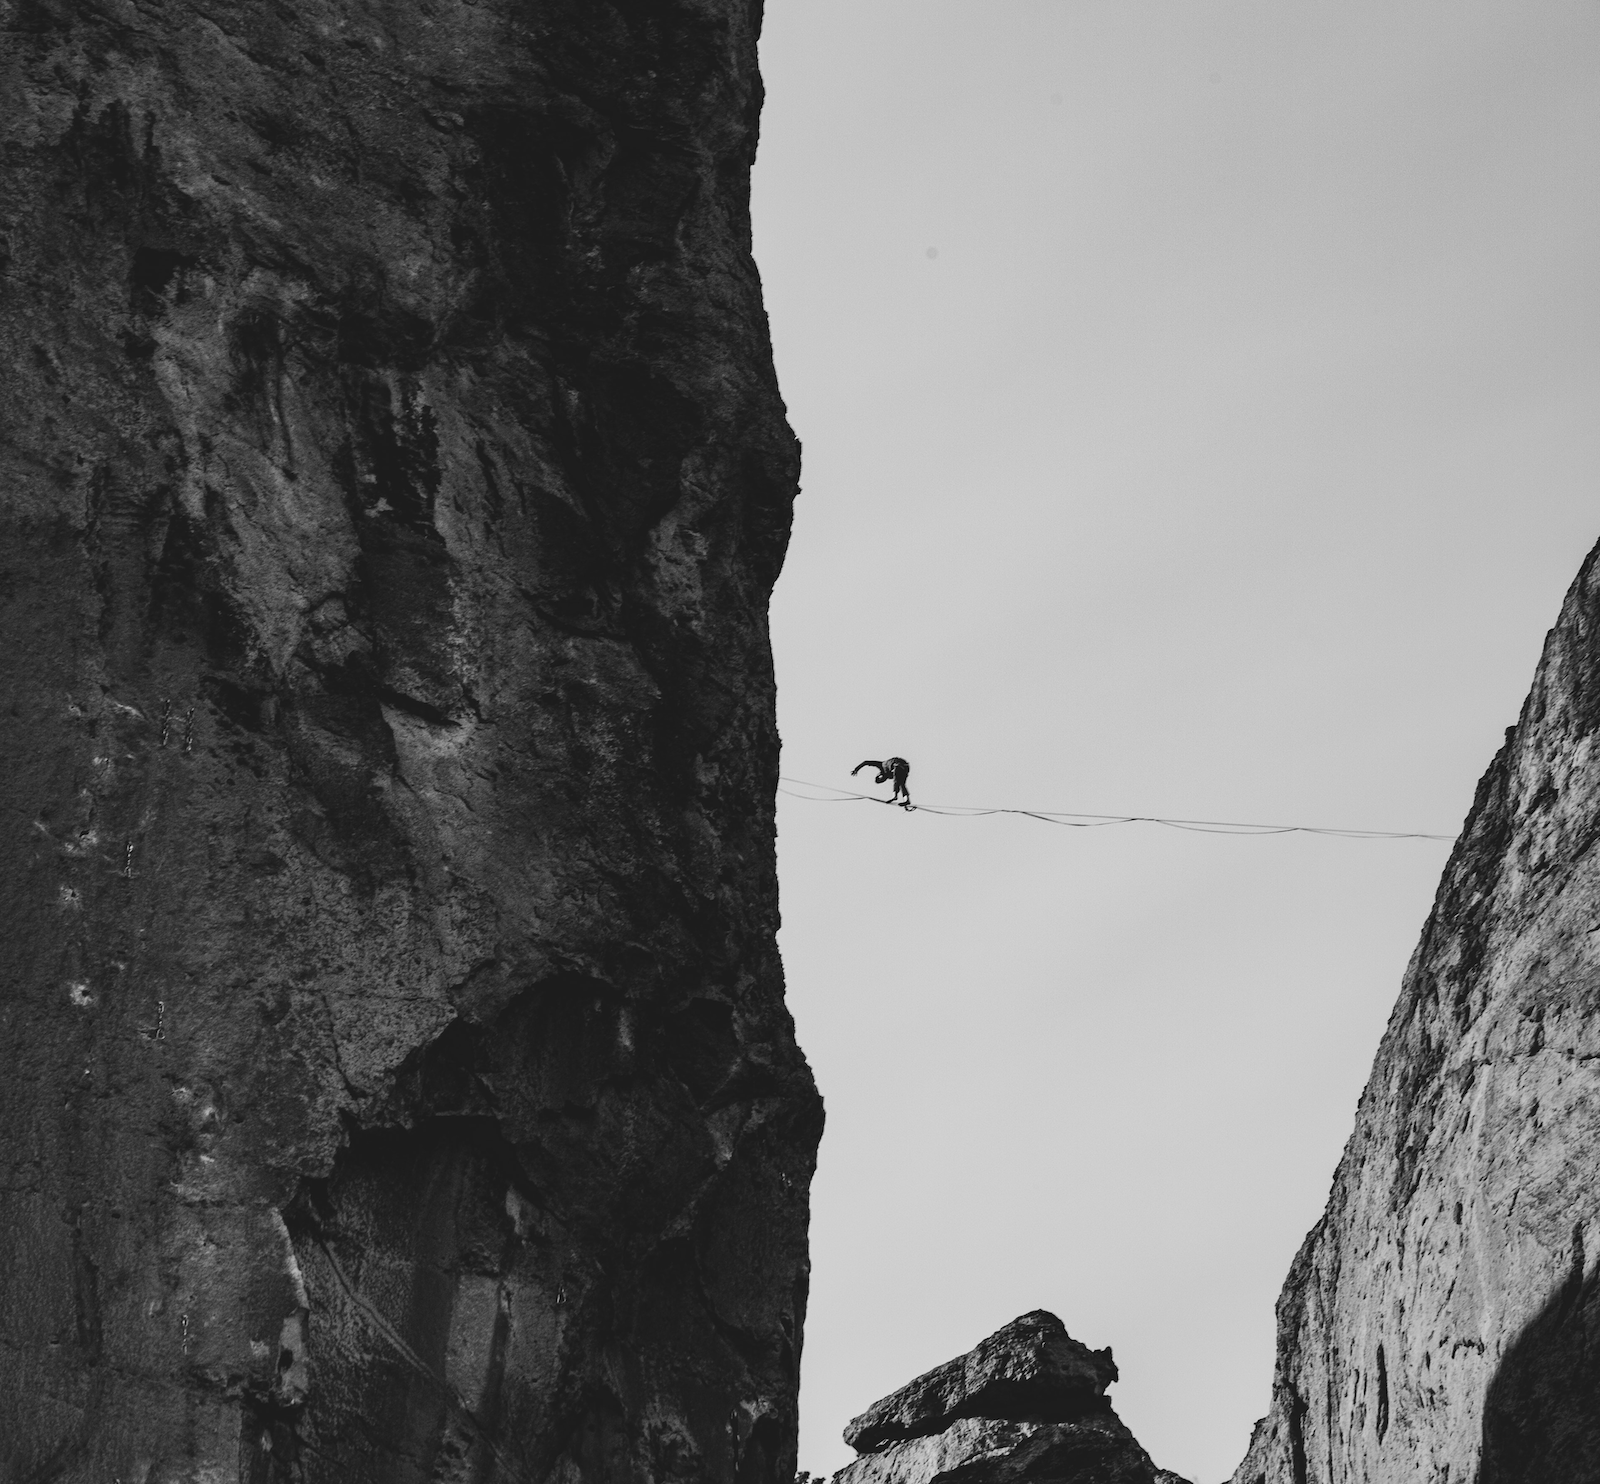 Balancing life is like walking a tightrope. Coaching can help